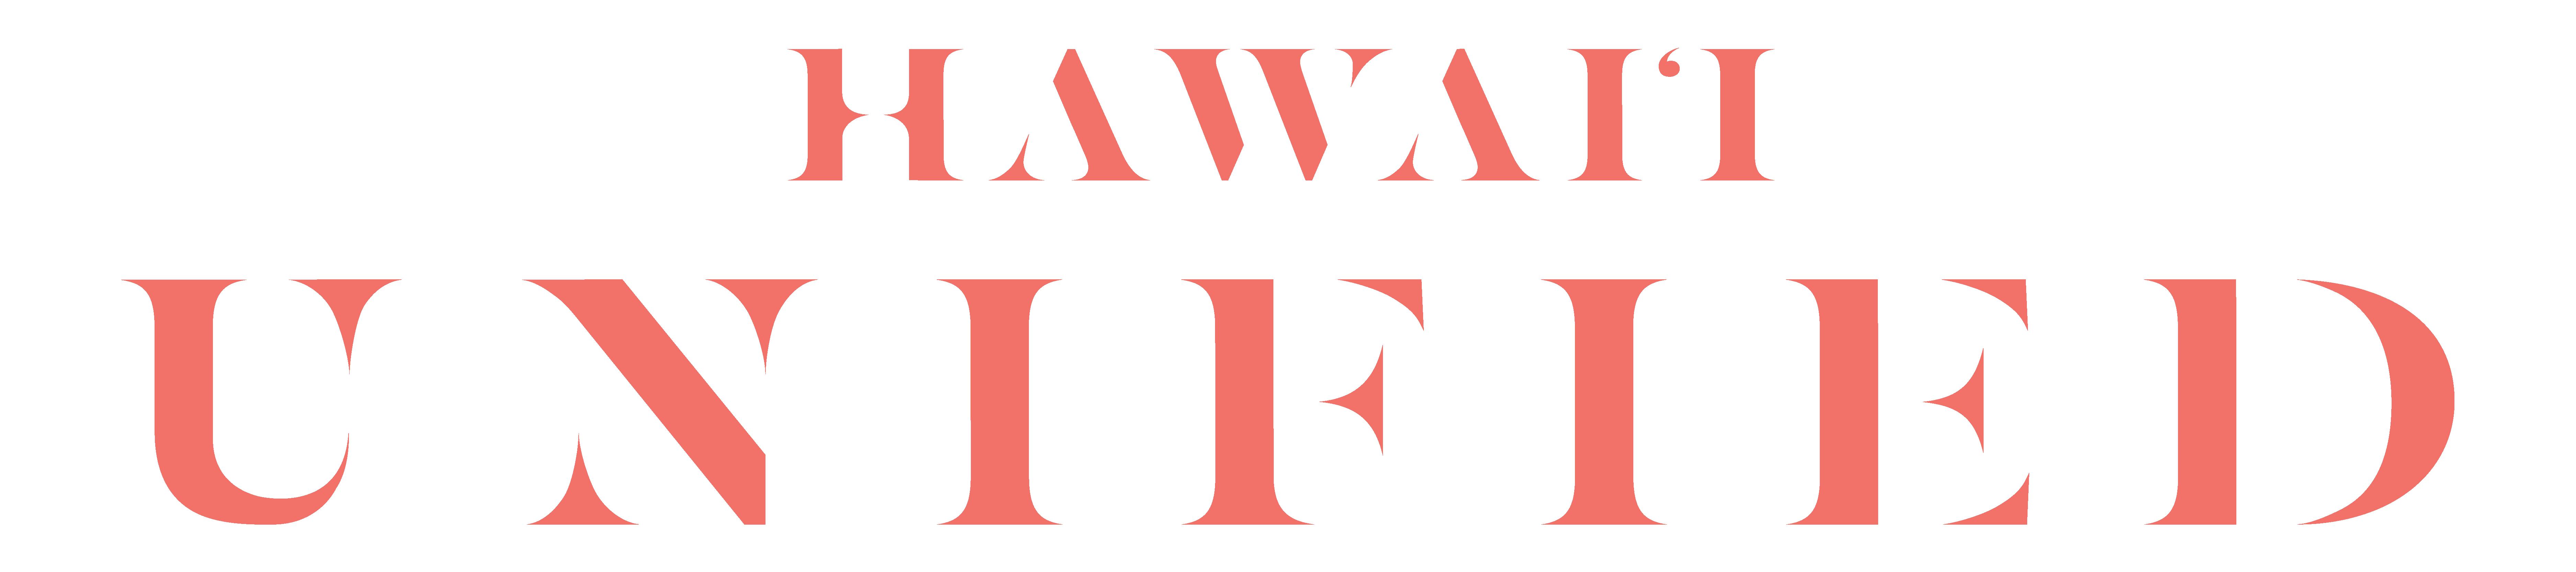 Hawaii Unified